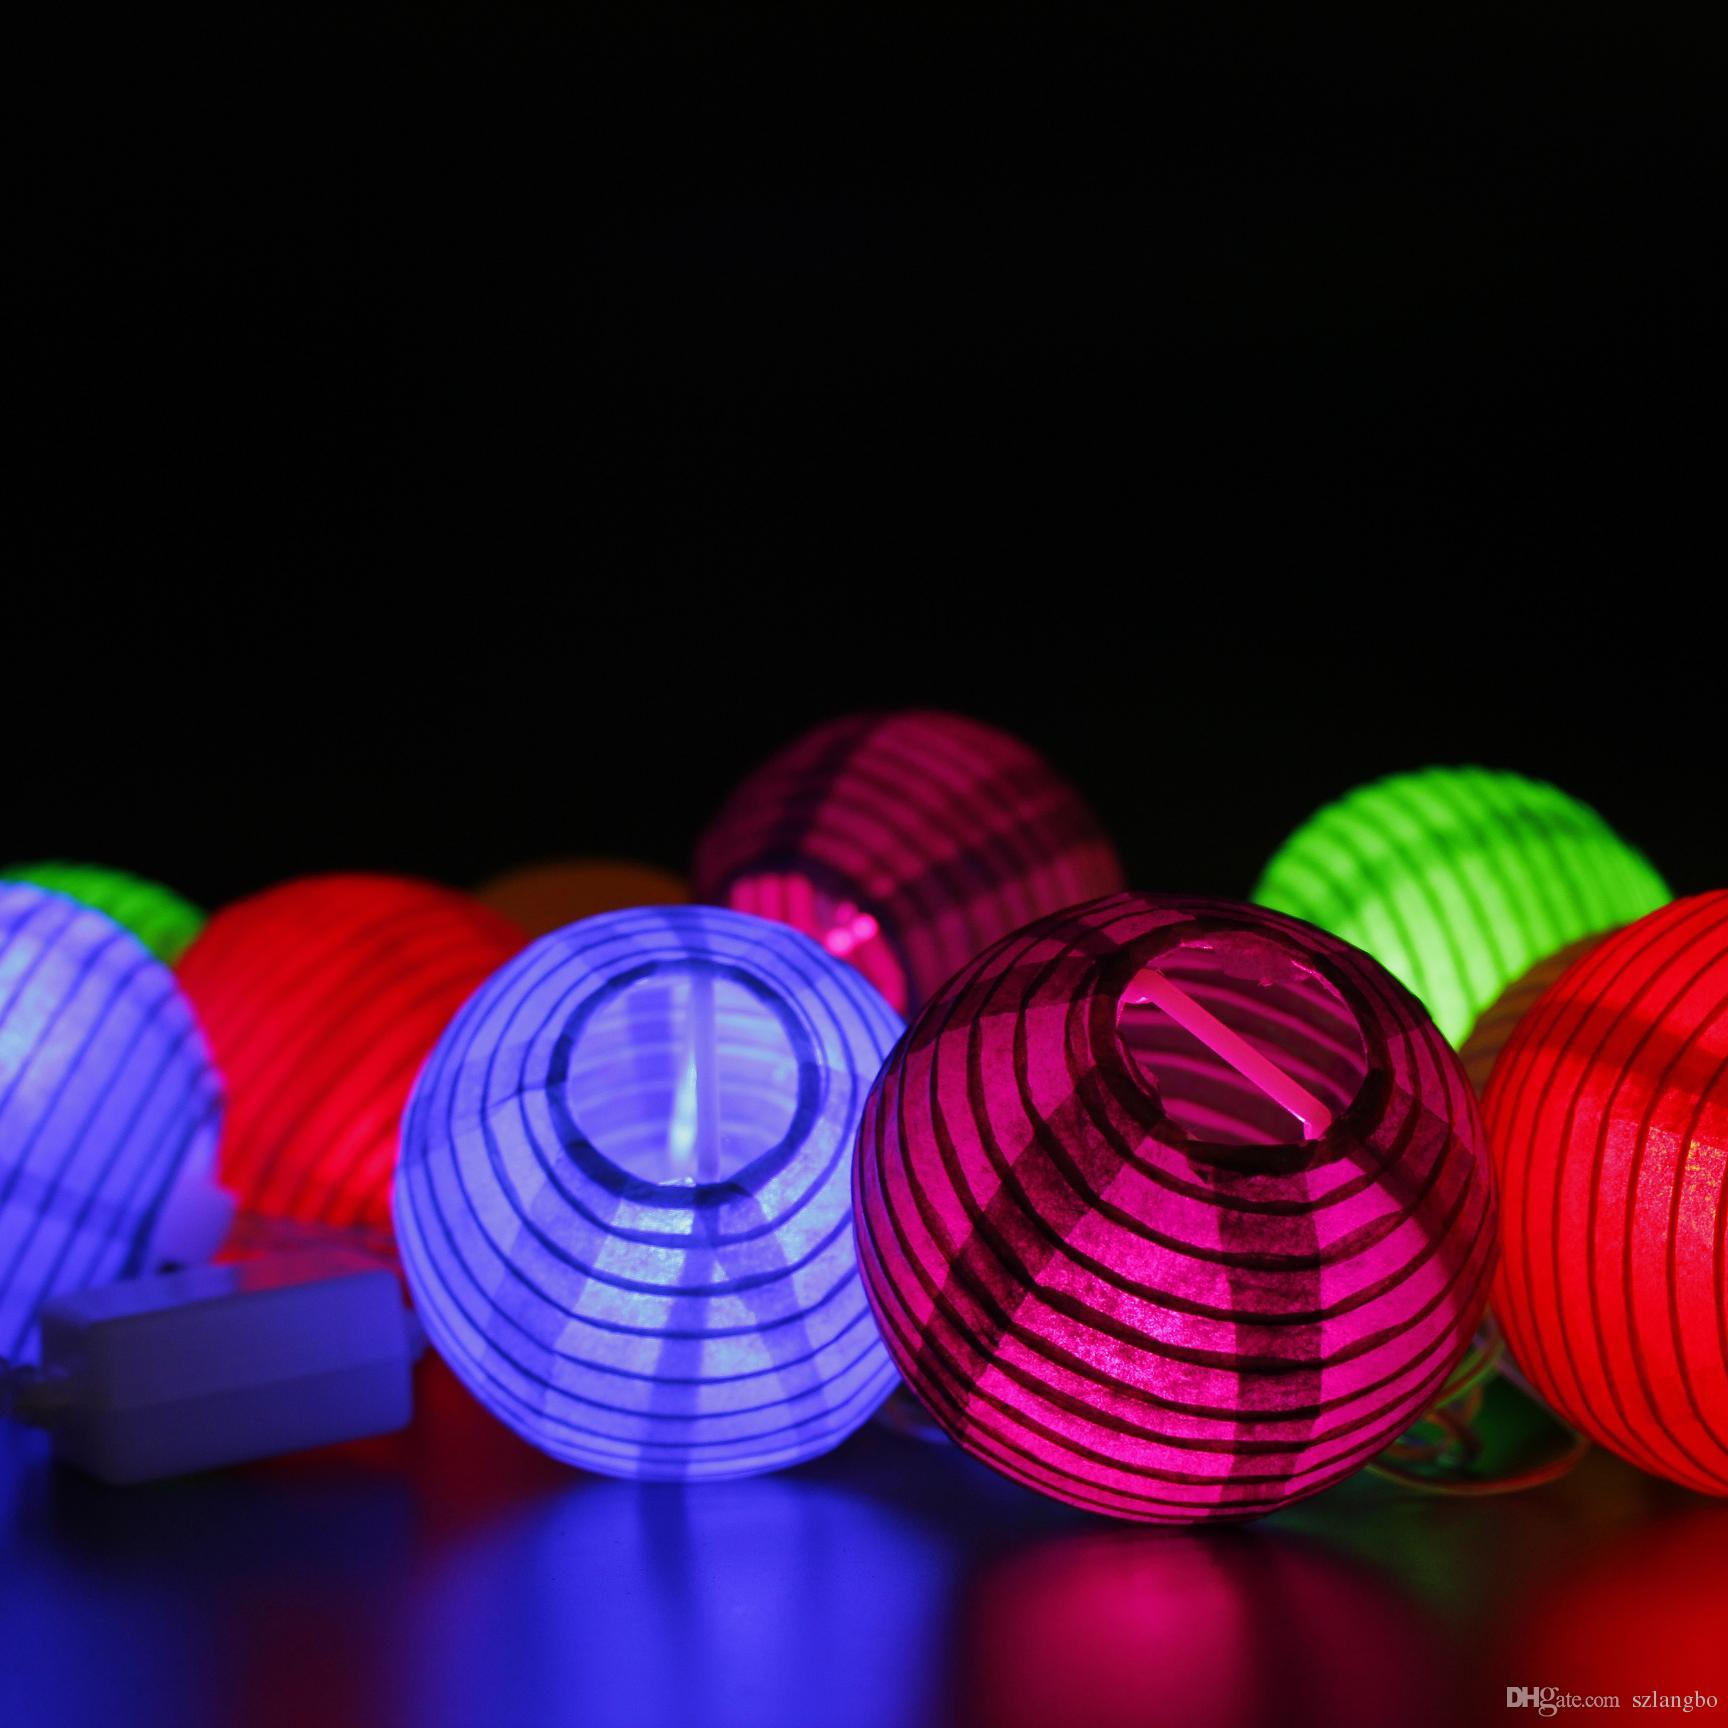 2w ac110v input us plug colorful paper lantern with 75mm diameter